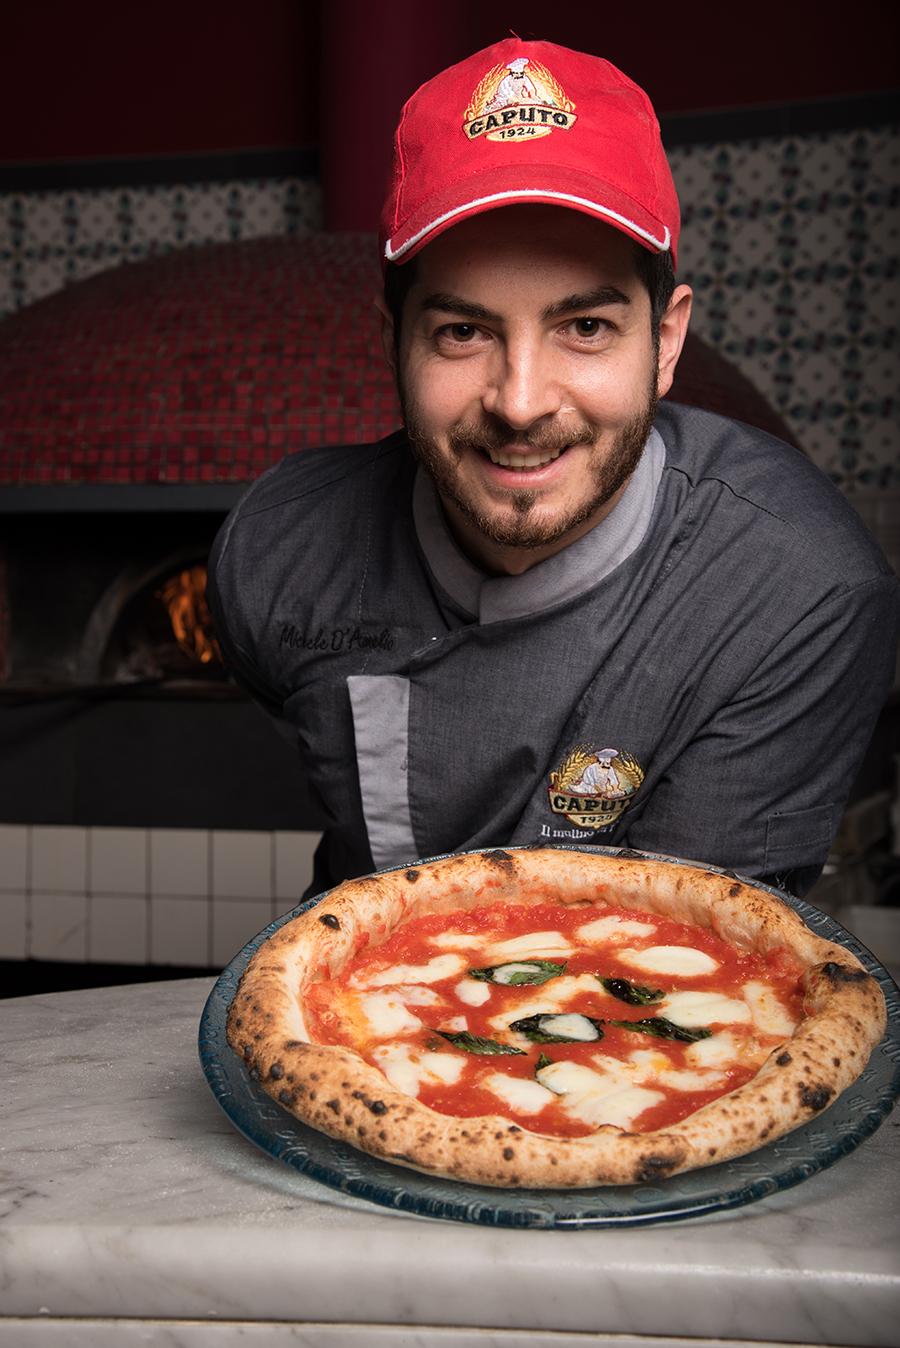 michele-presenting-pizza.jpg